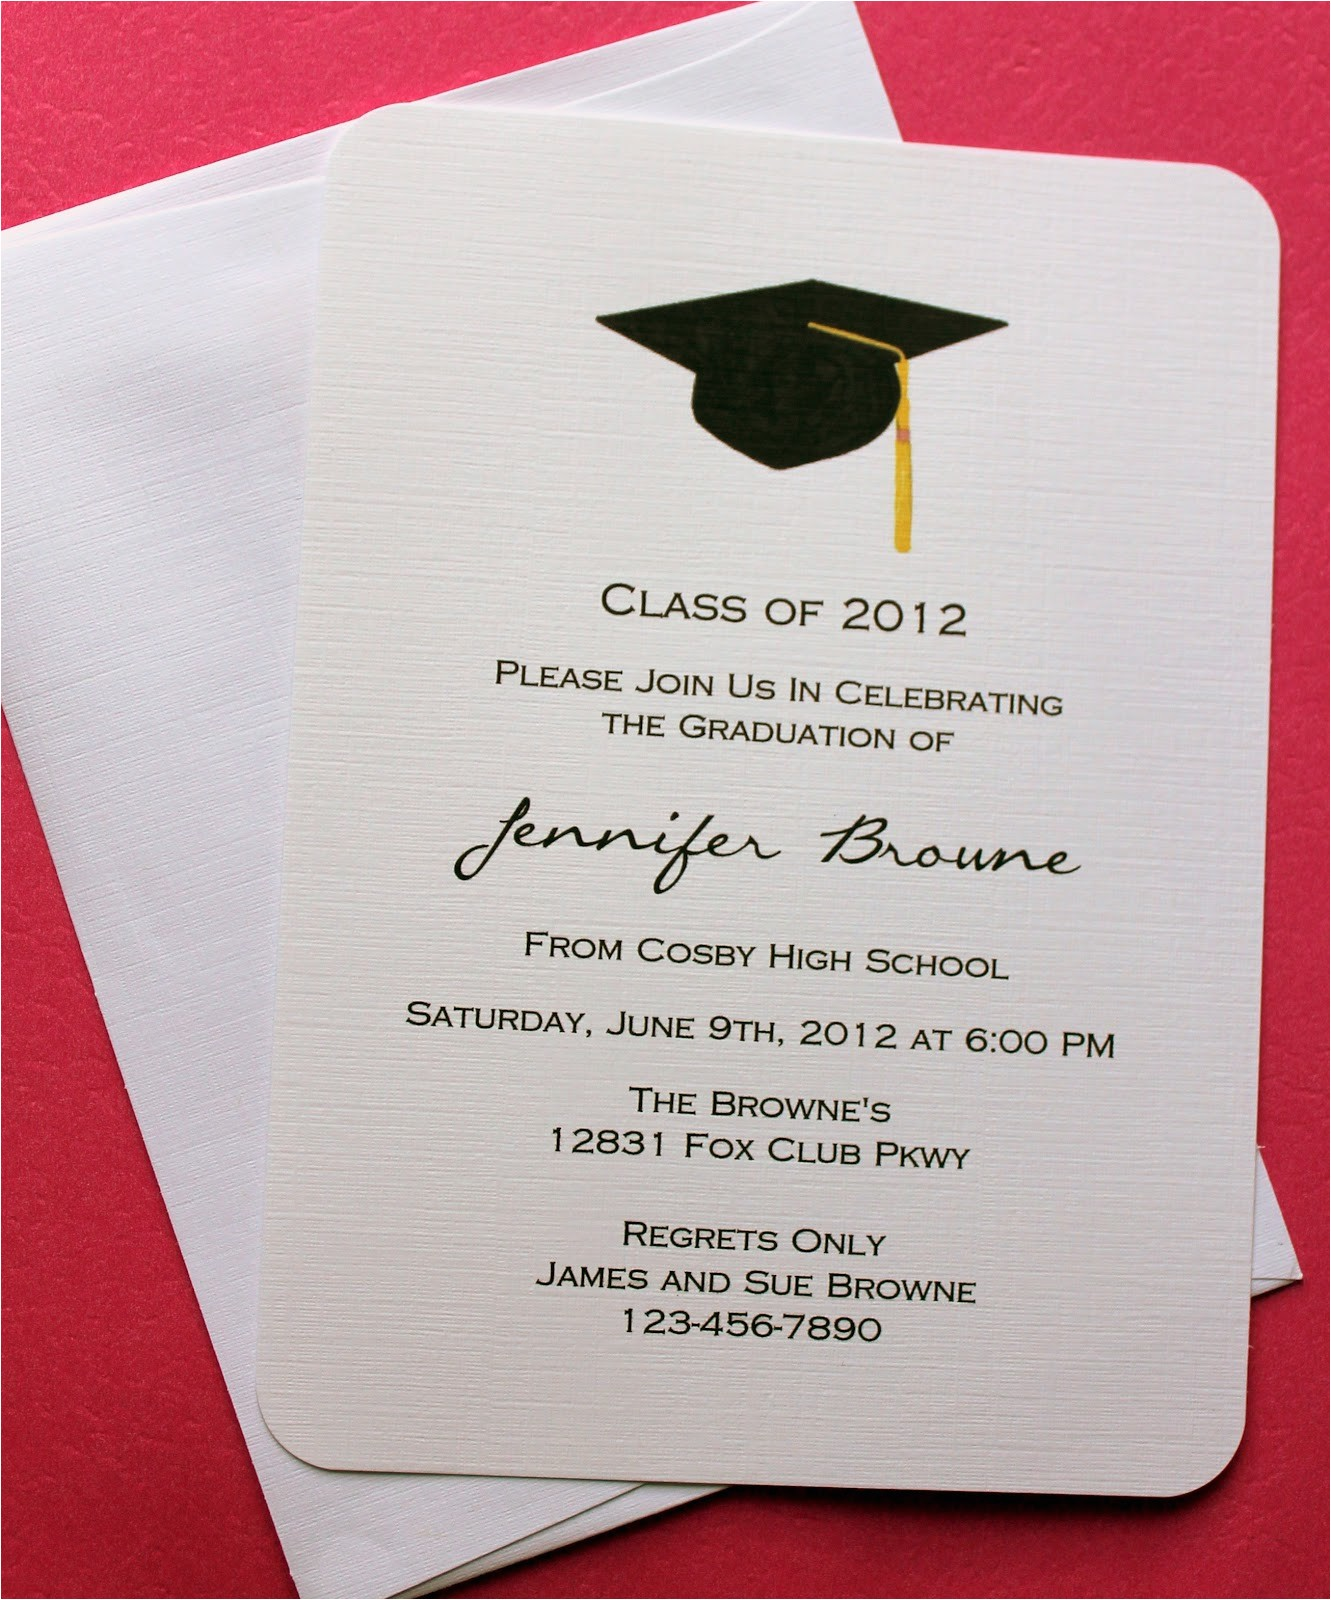 Graduation Invitation Card Sample Graduation Invitations Templates Invitation Templates